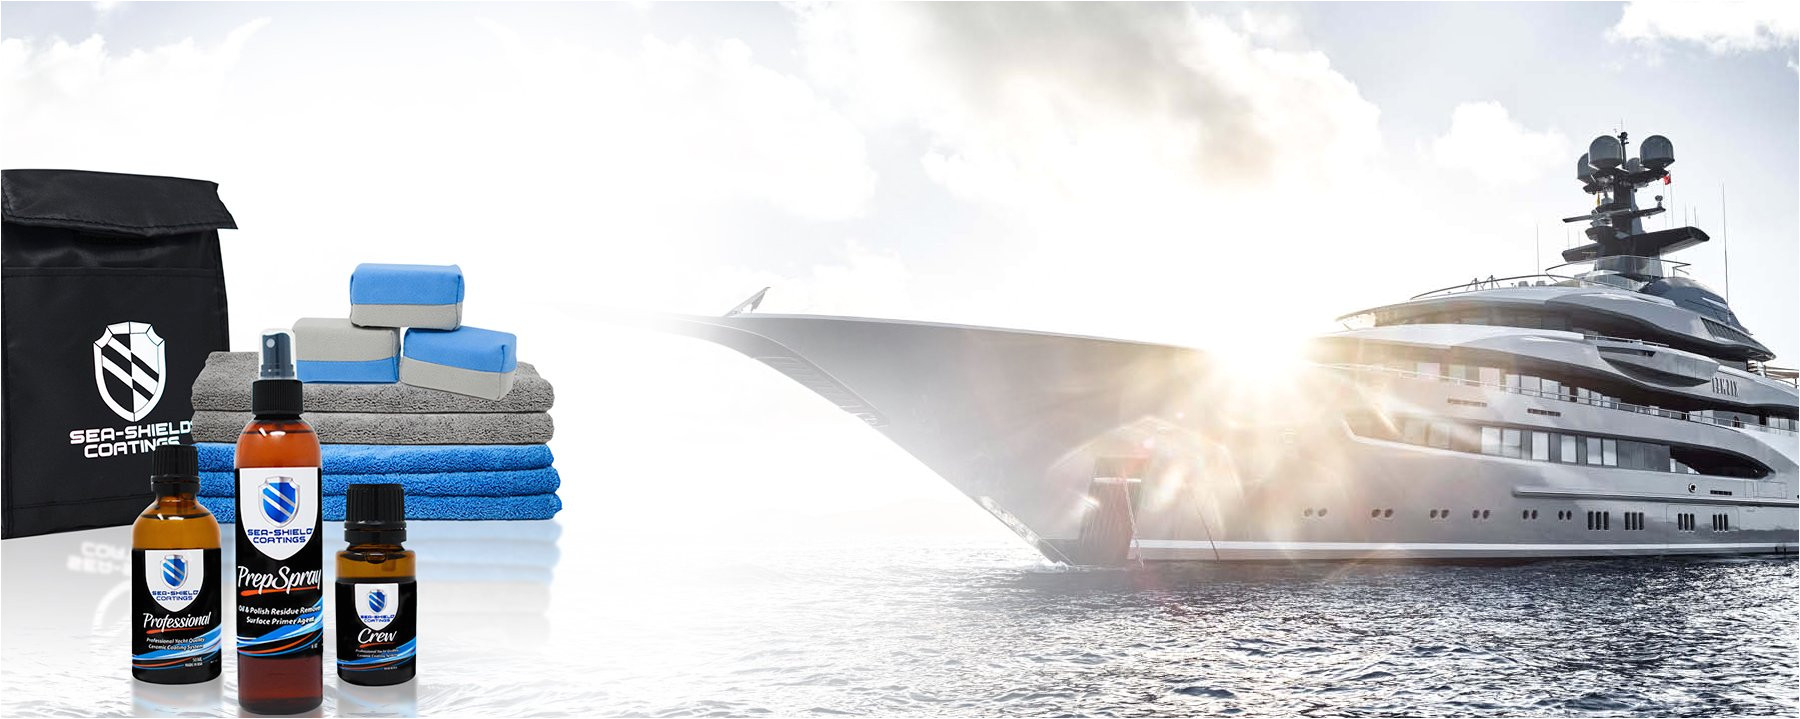 Pack and Ship Store Naples Fl Yacht Polish Boat Polish Products Ceramic Coating Sea Shield